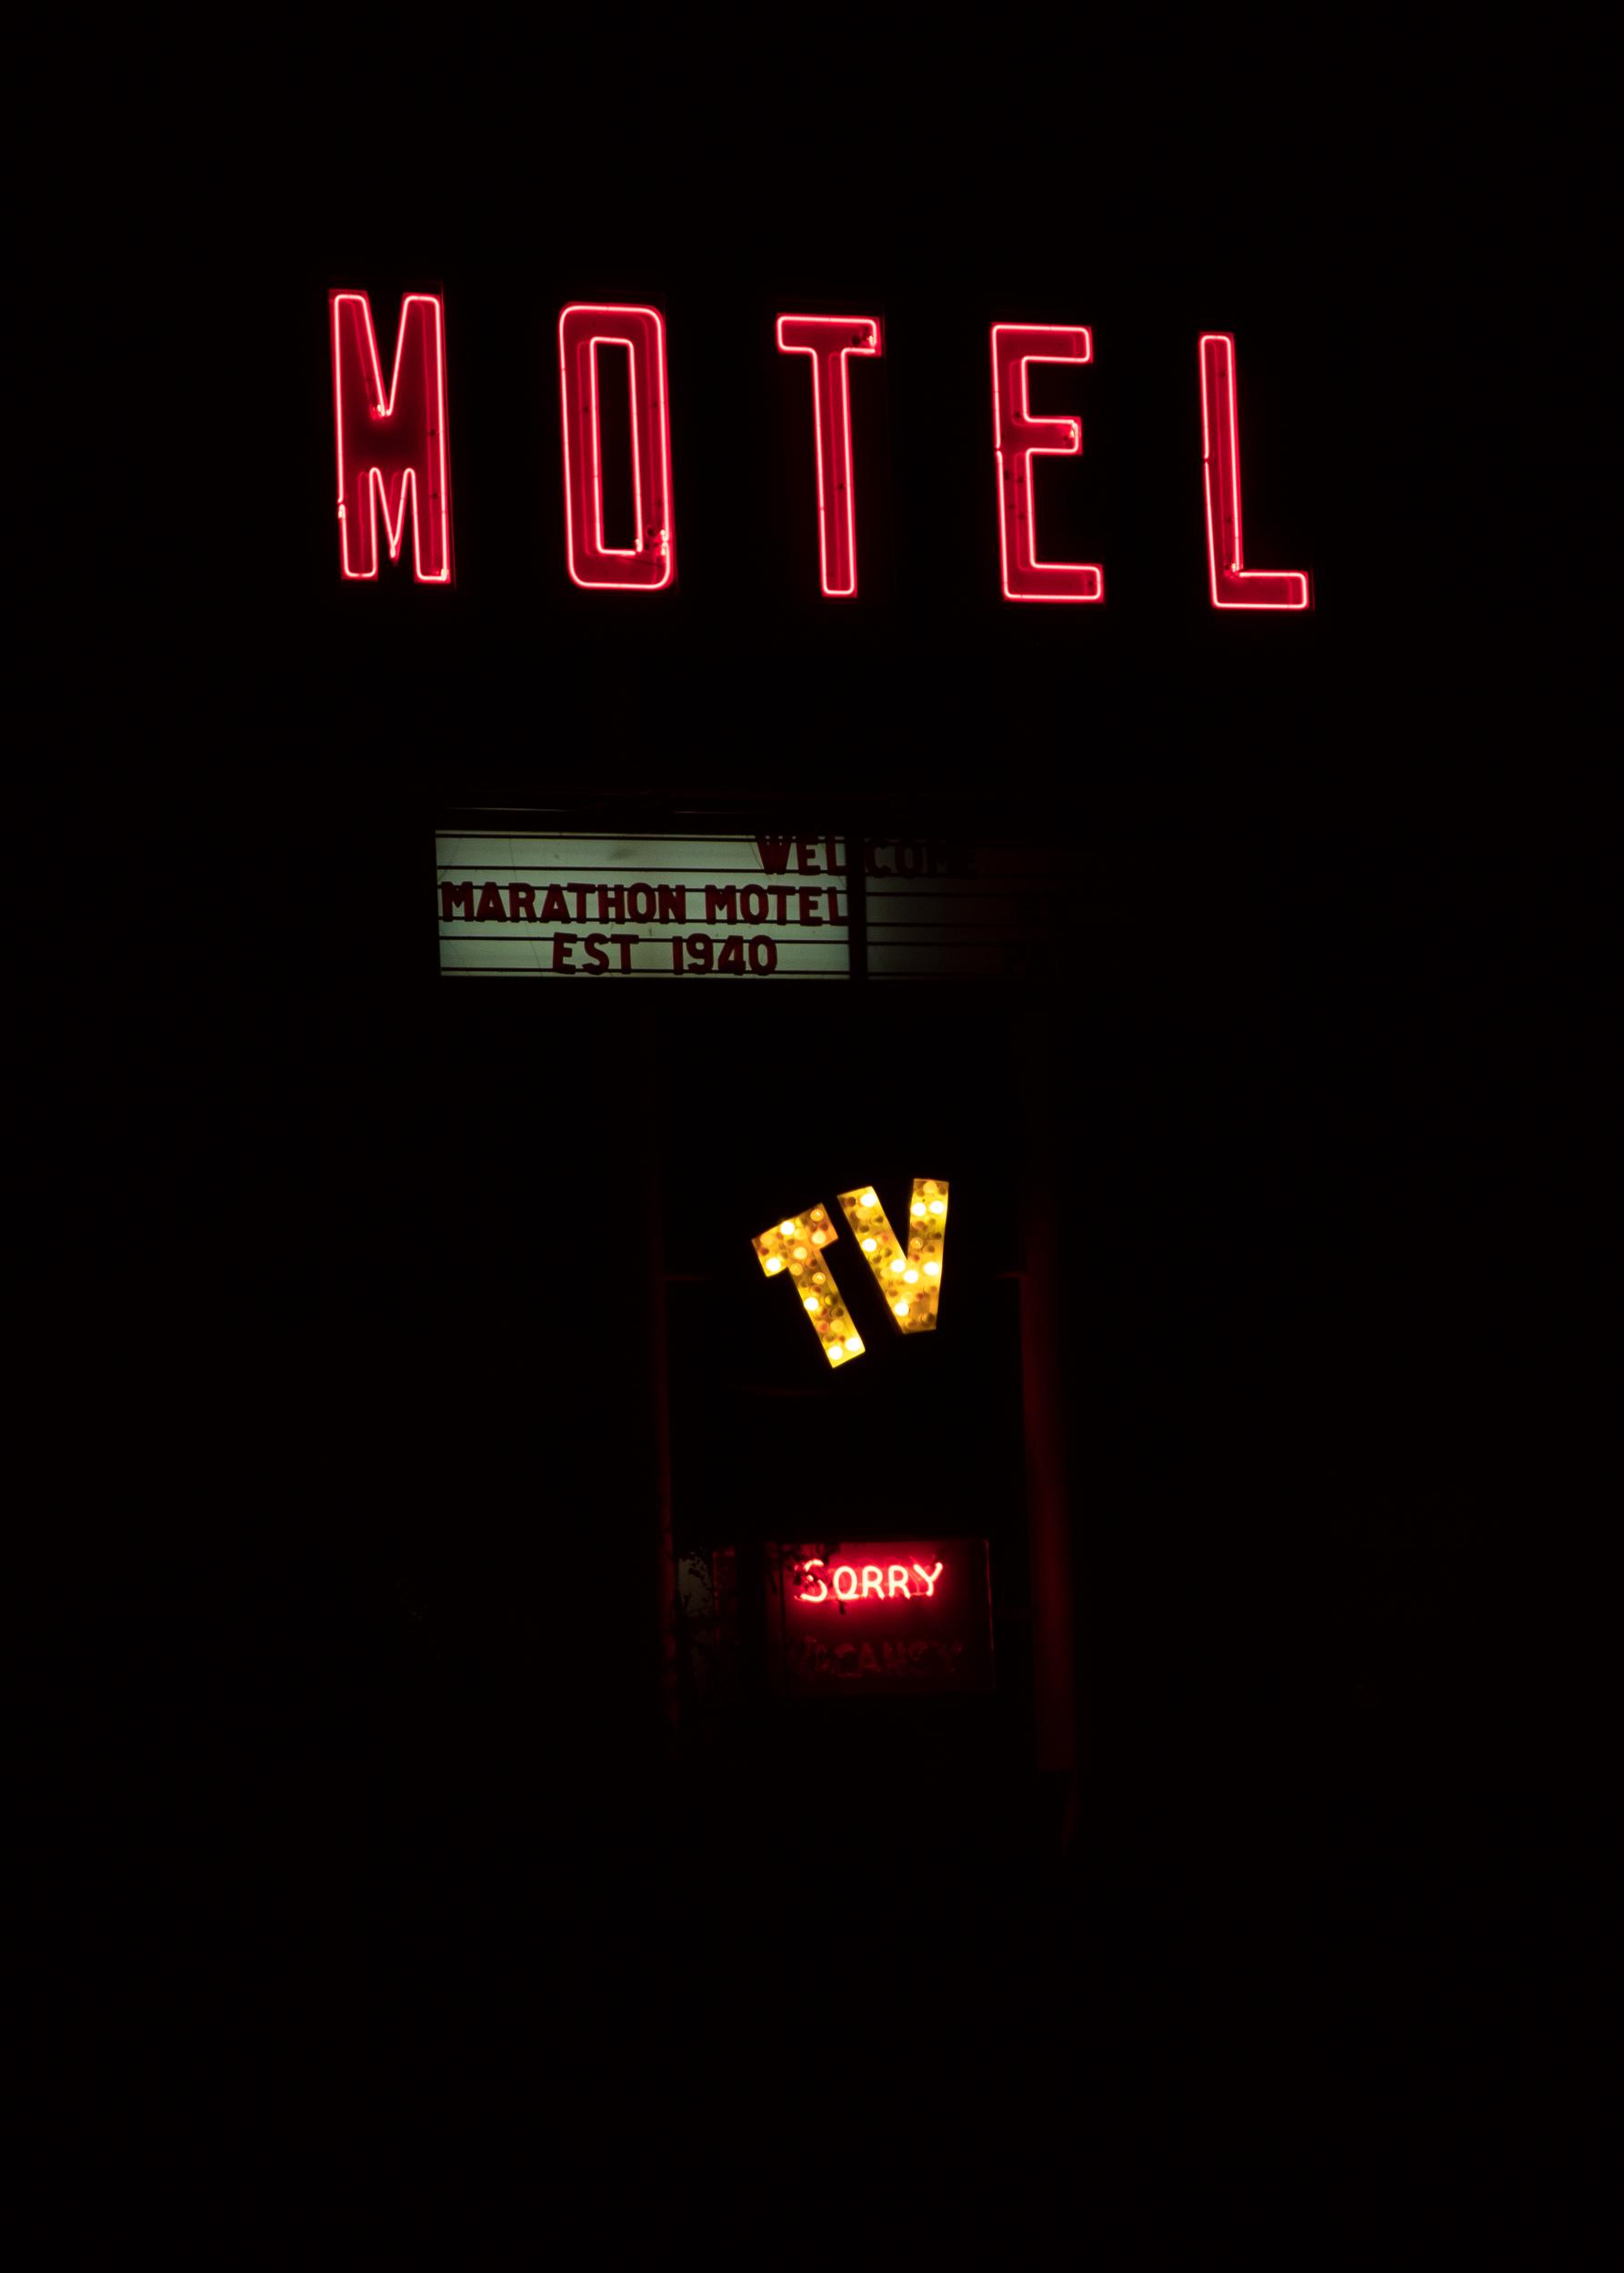 Hotel_Motel.jpg